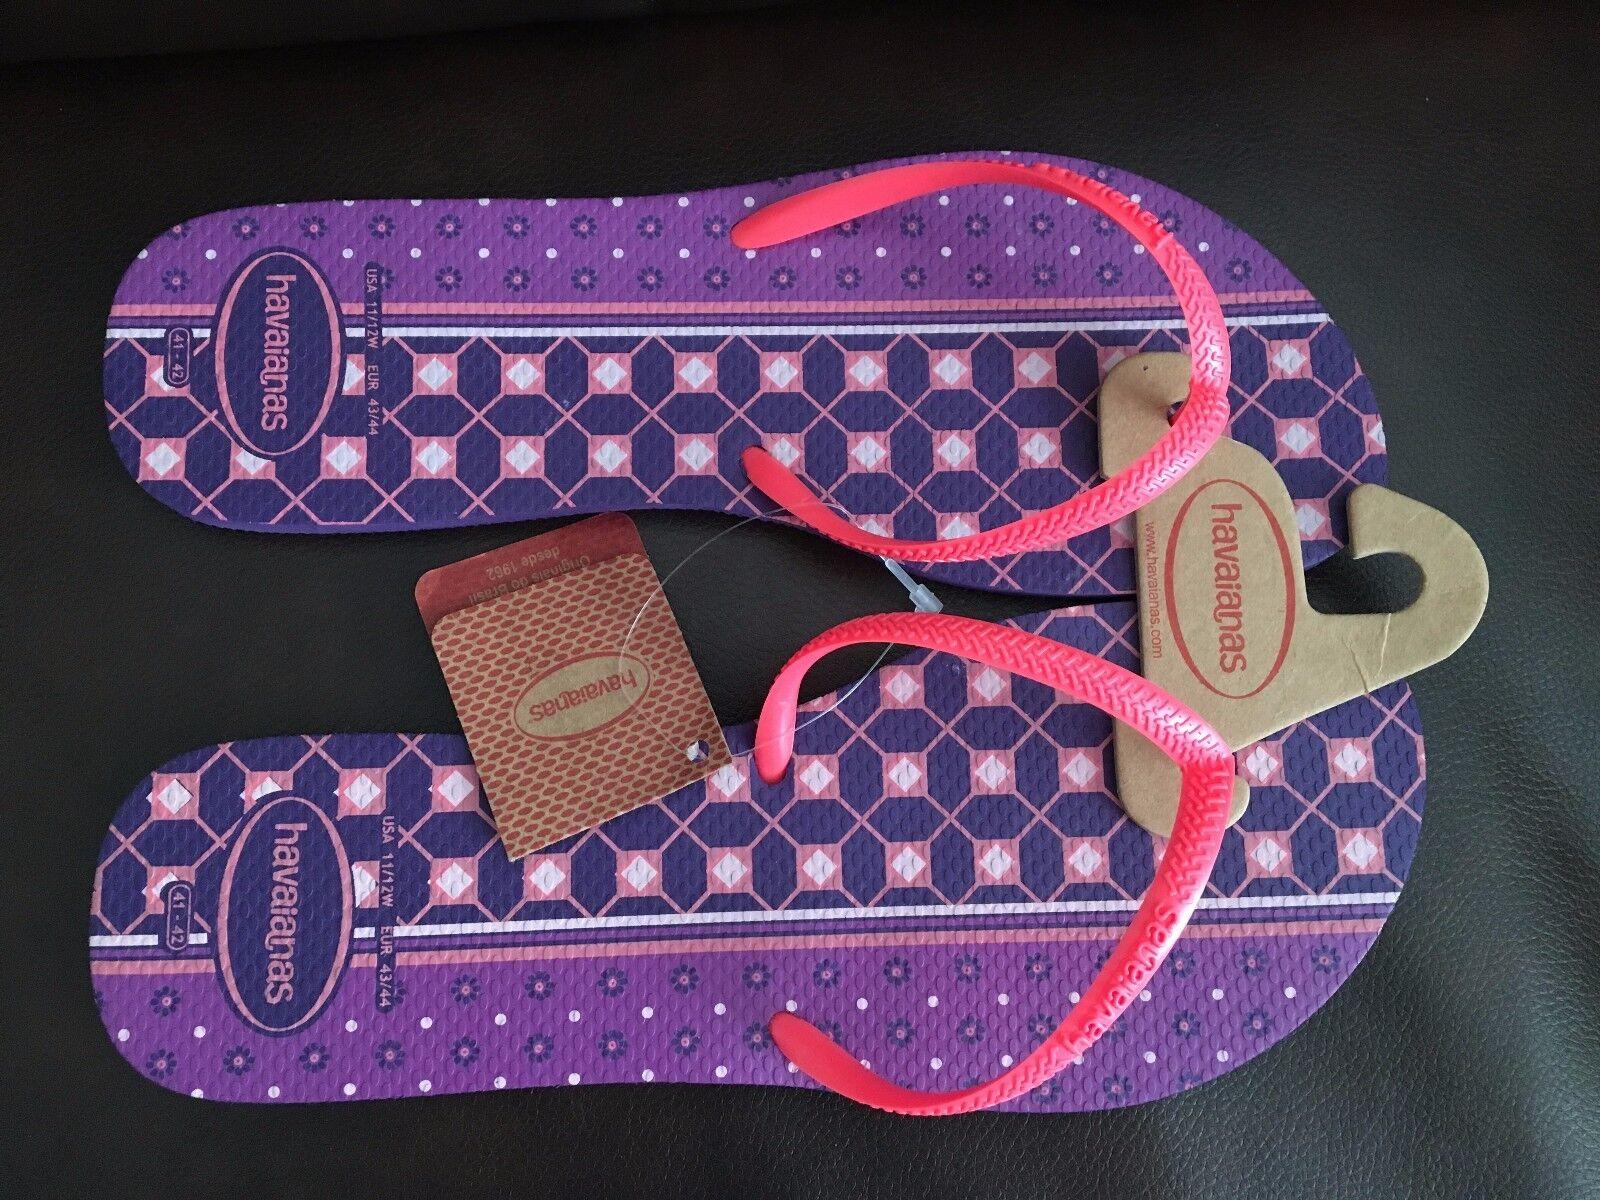 NEW Havaianas 'Slim' Women Flip Flop Sandal Women 'Slim' SZ 11 724eb3